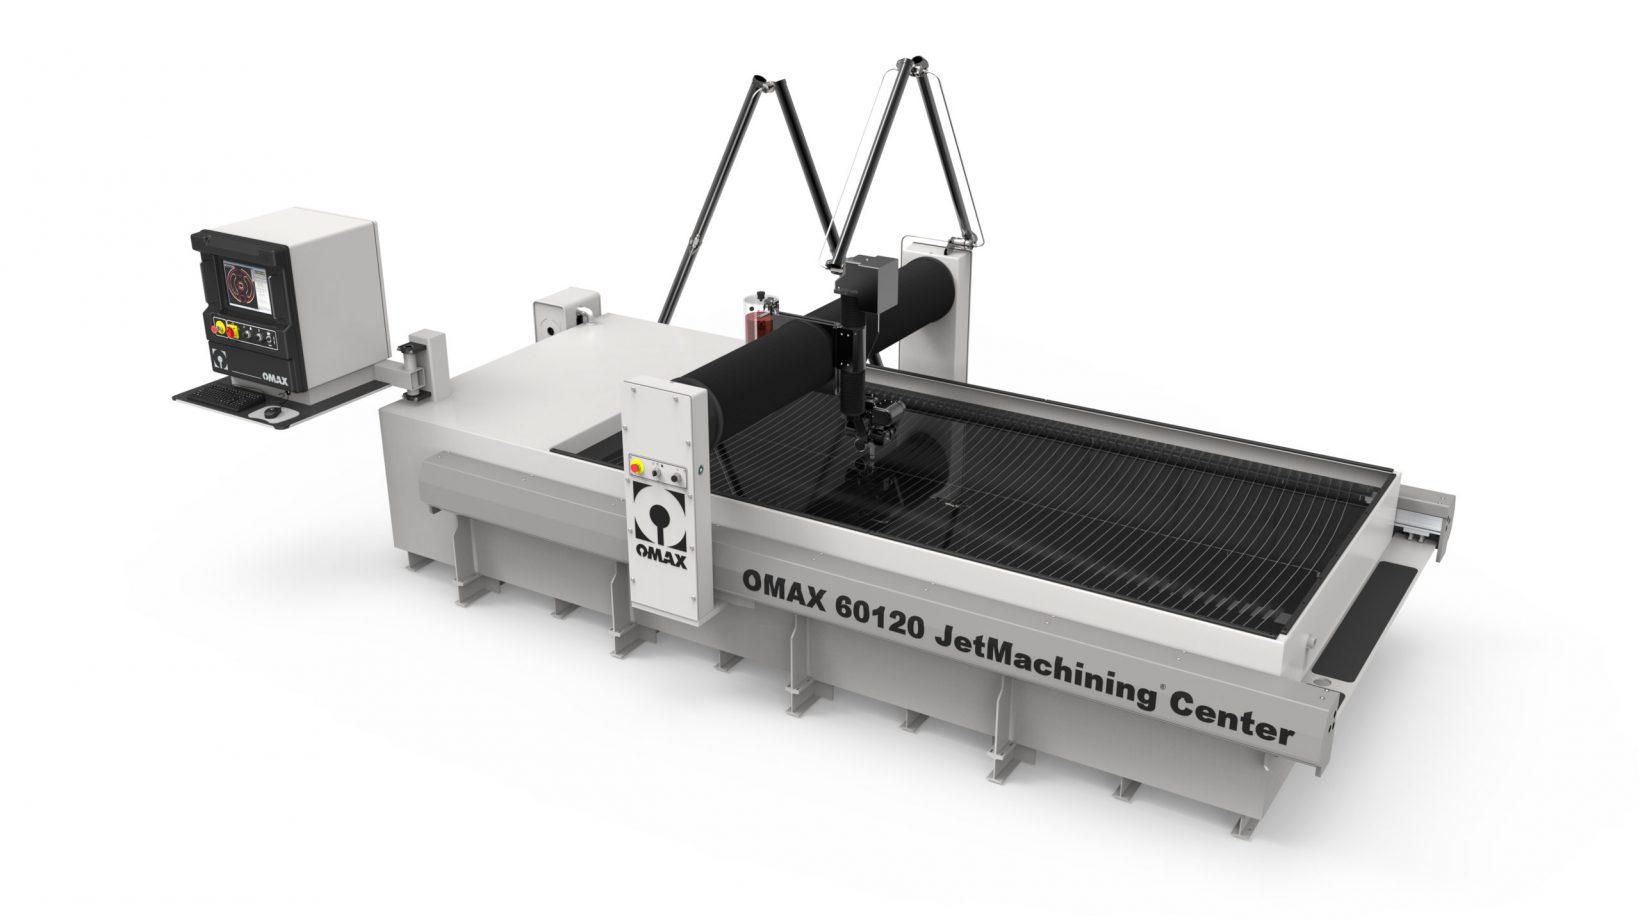 Omax 60120 Jetmachine